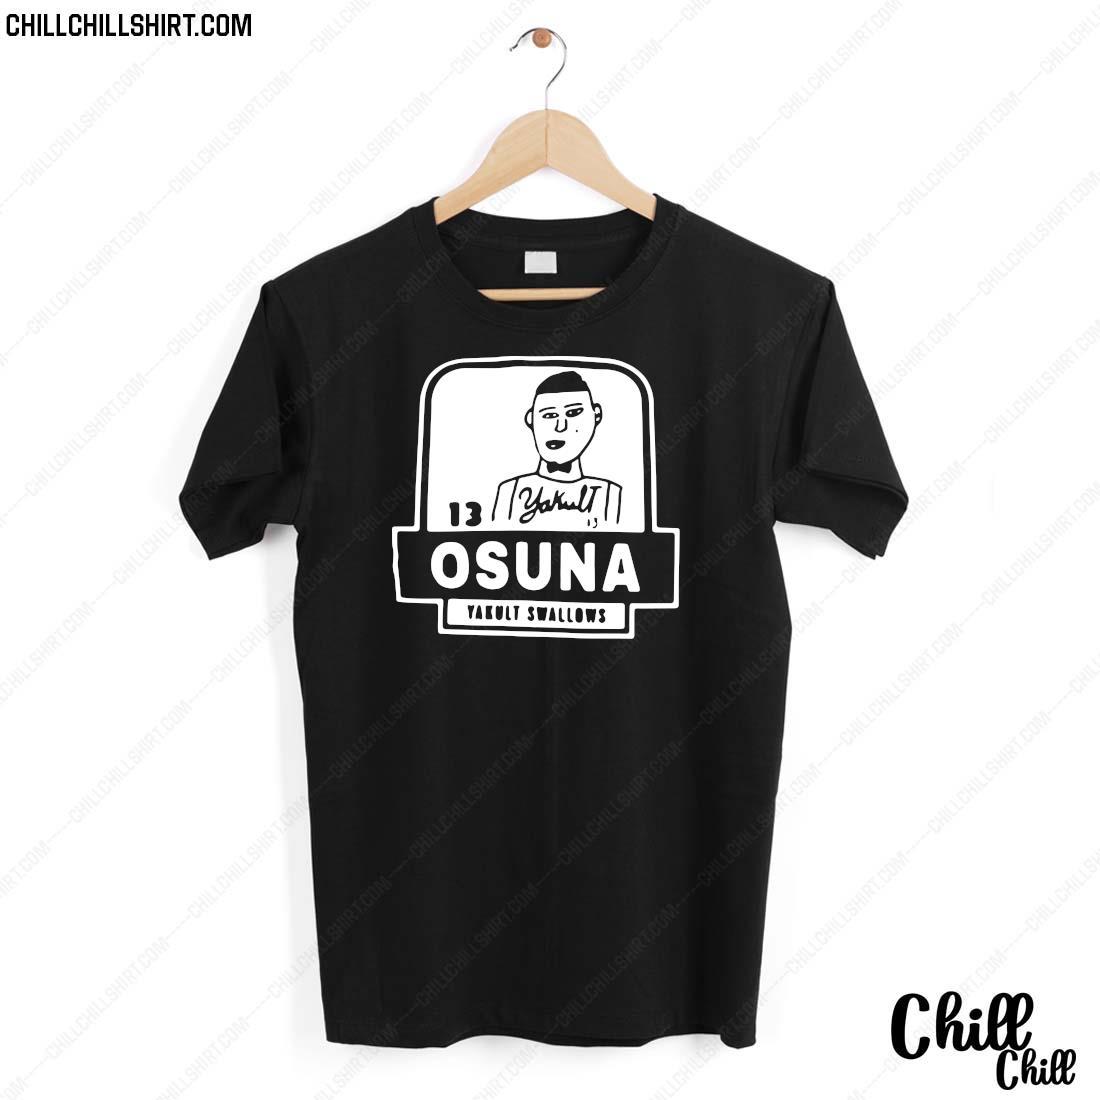 13 Yakult Osuna Yakult Swallows Shirt